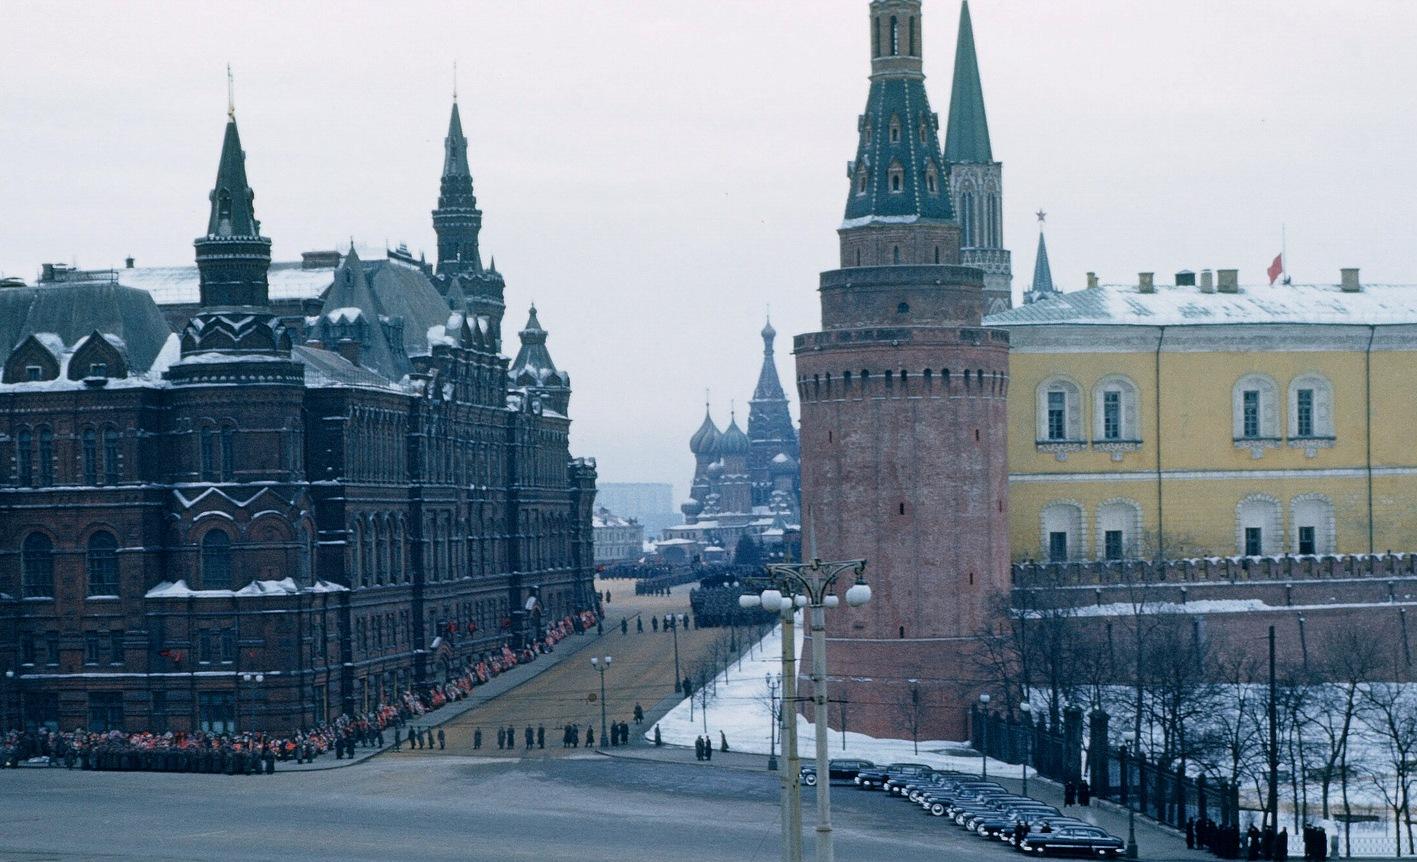 Архив Манхоффа: опубликовано ранее неизвестное видео похорон Сталина